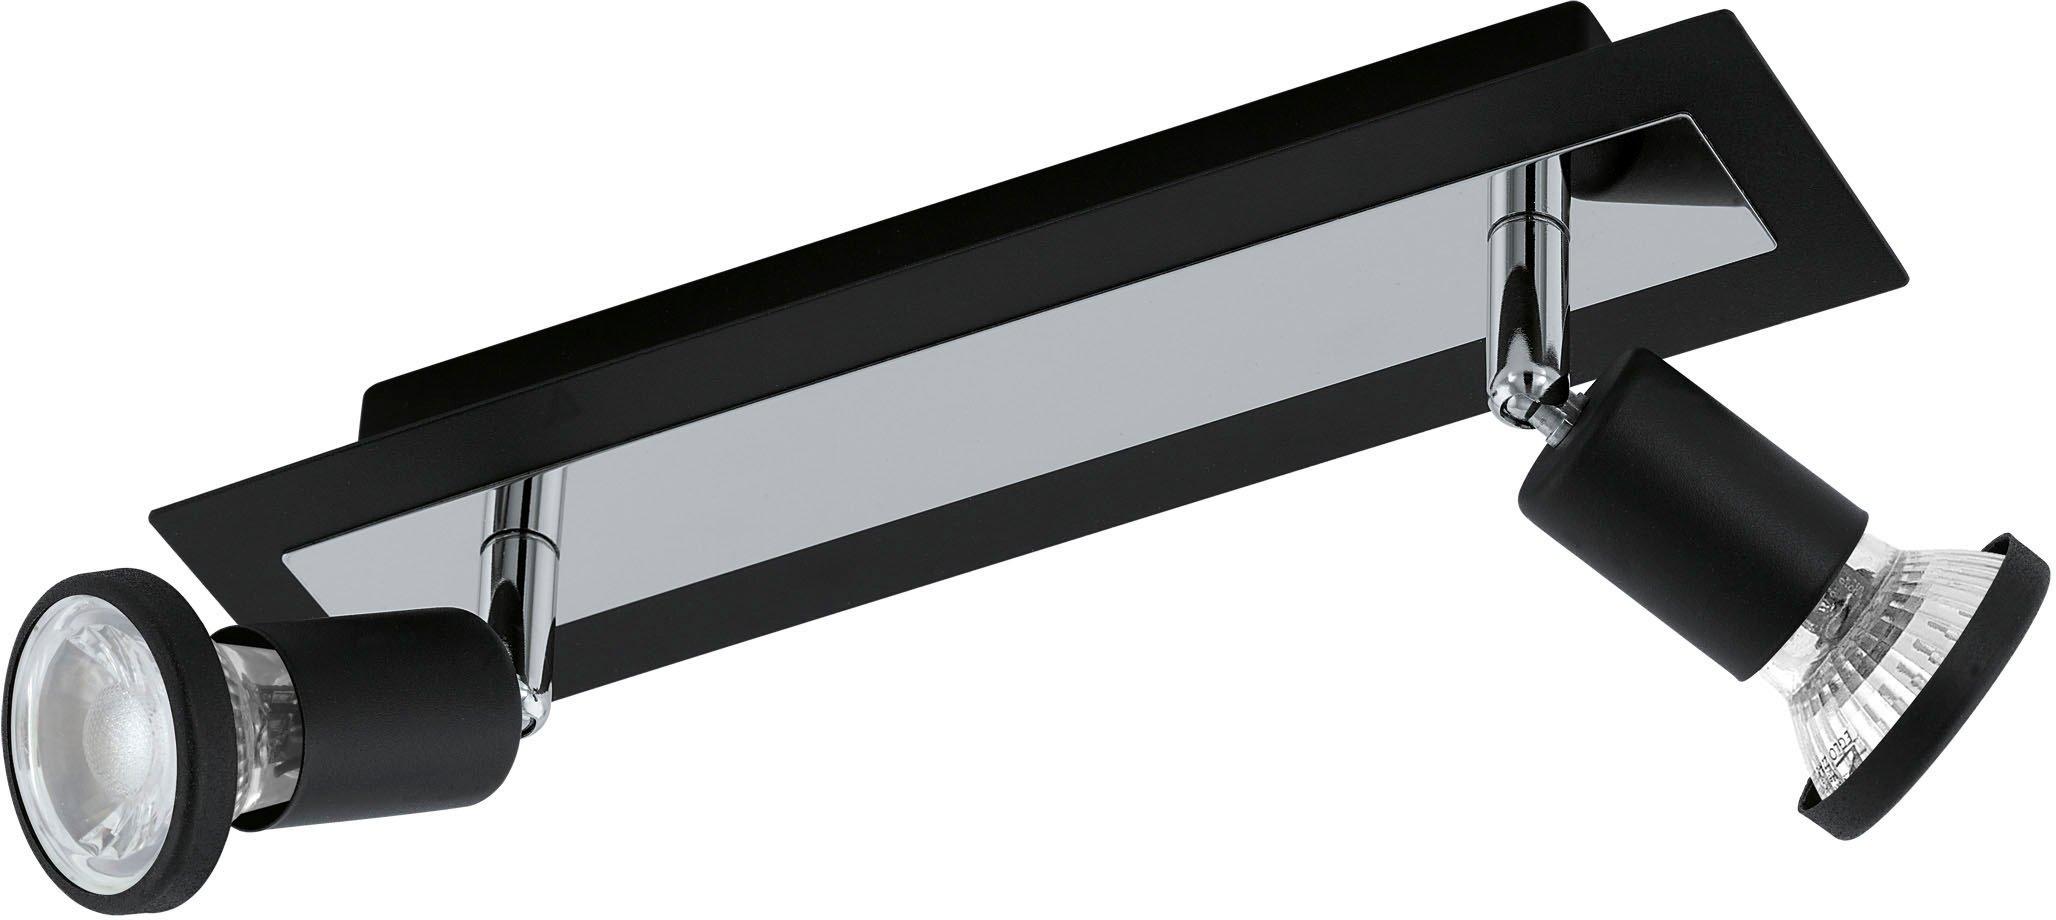 EGLO led-plafondspots SARRIA Led-plafondlamp - verschillende betaalmethodes